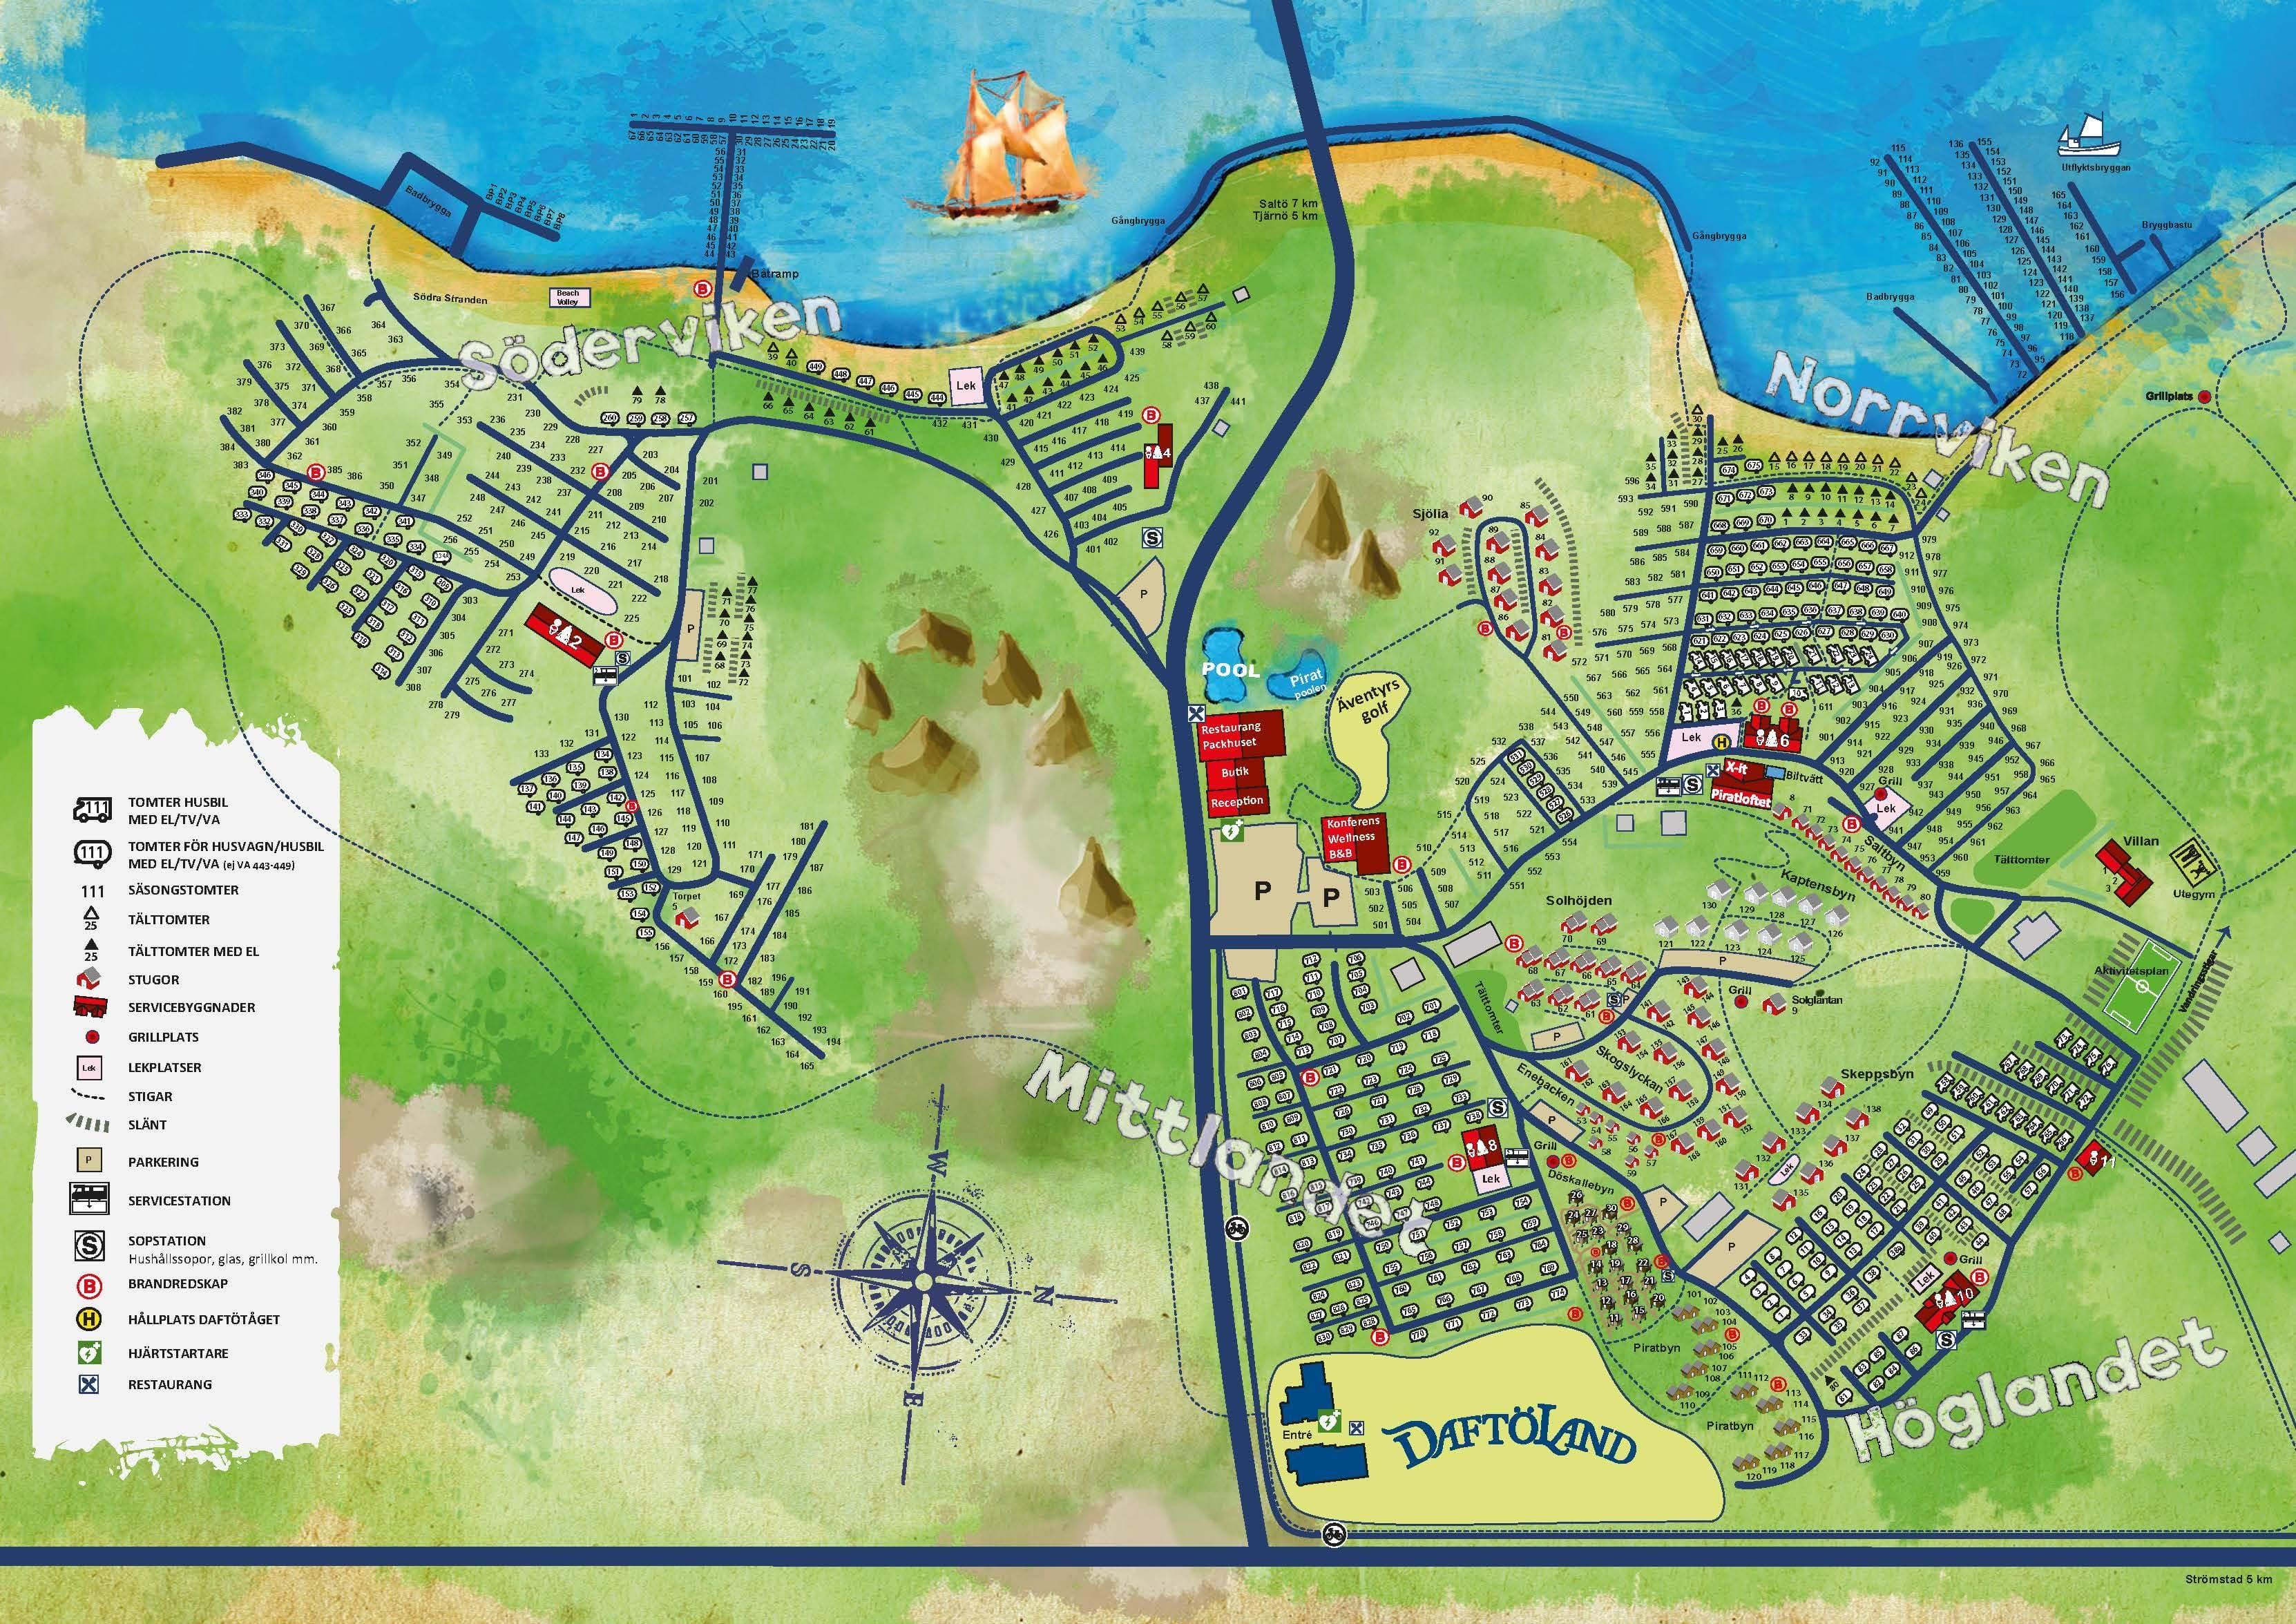 Karta Vastkusten Bohuslan.Boende Pa Dafto Resort I Stromstad Nara Havet